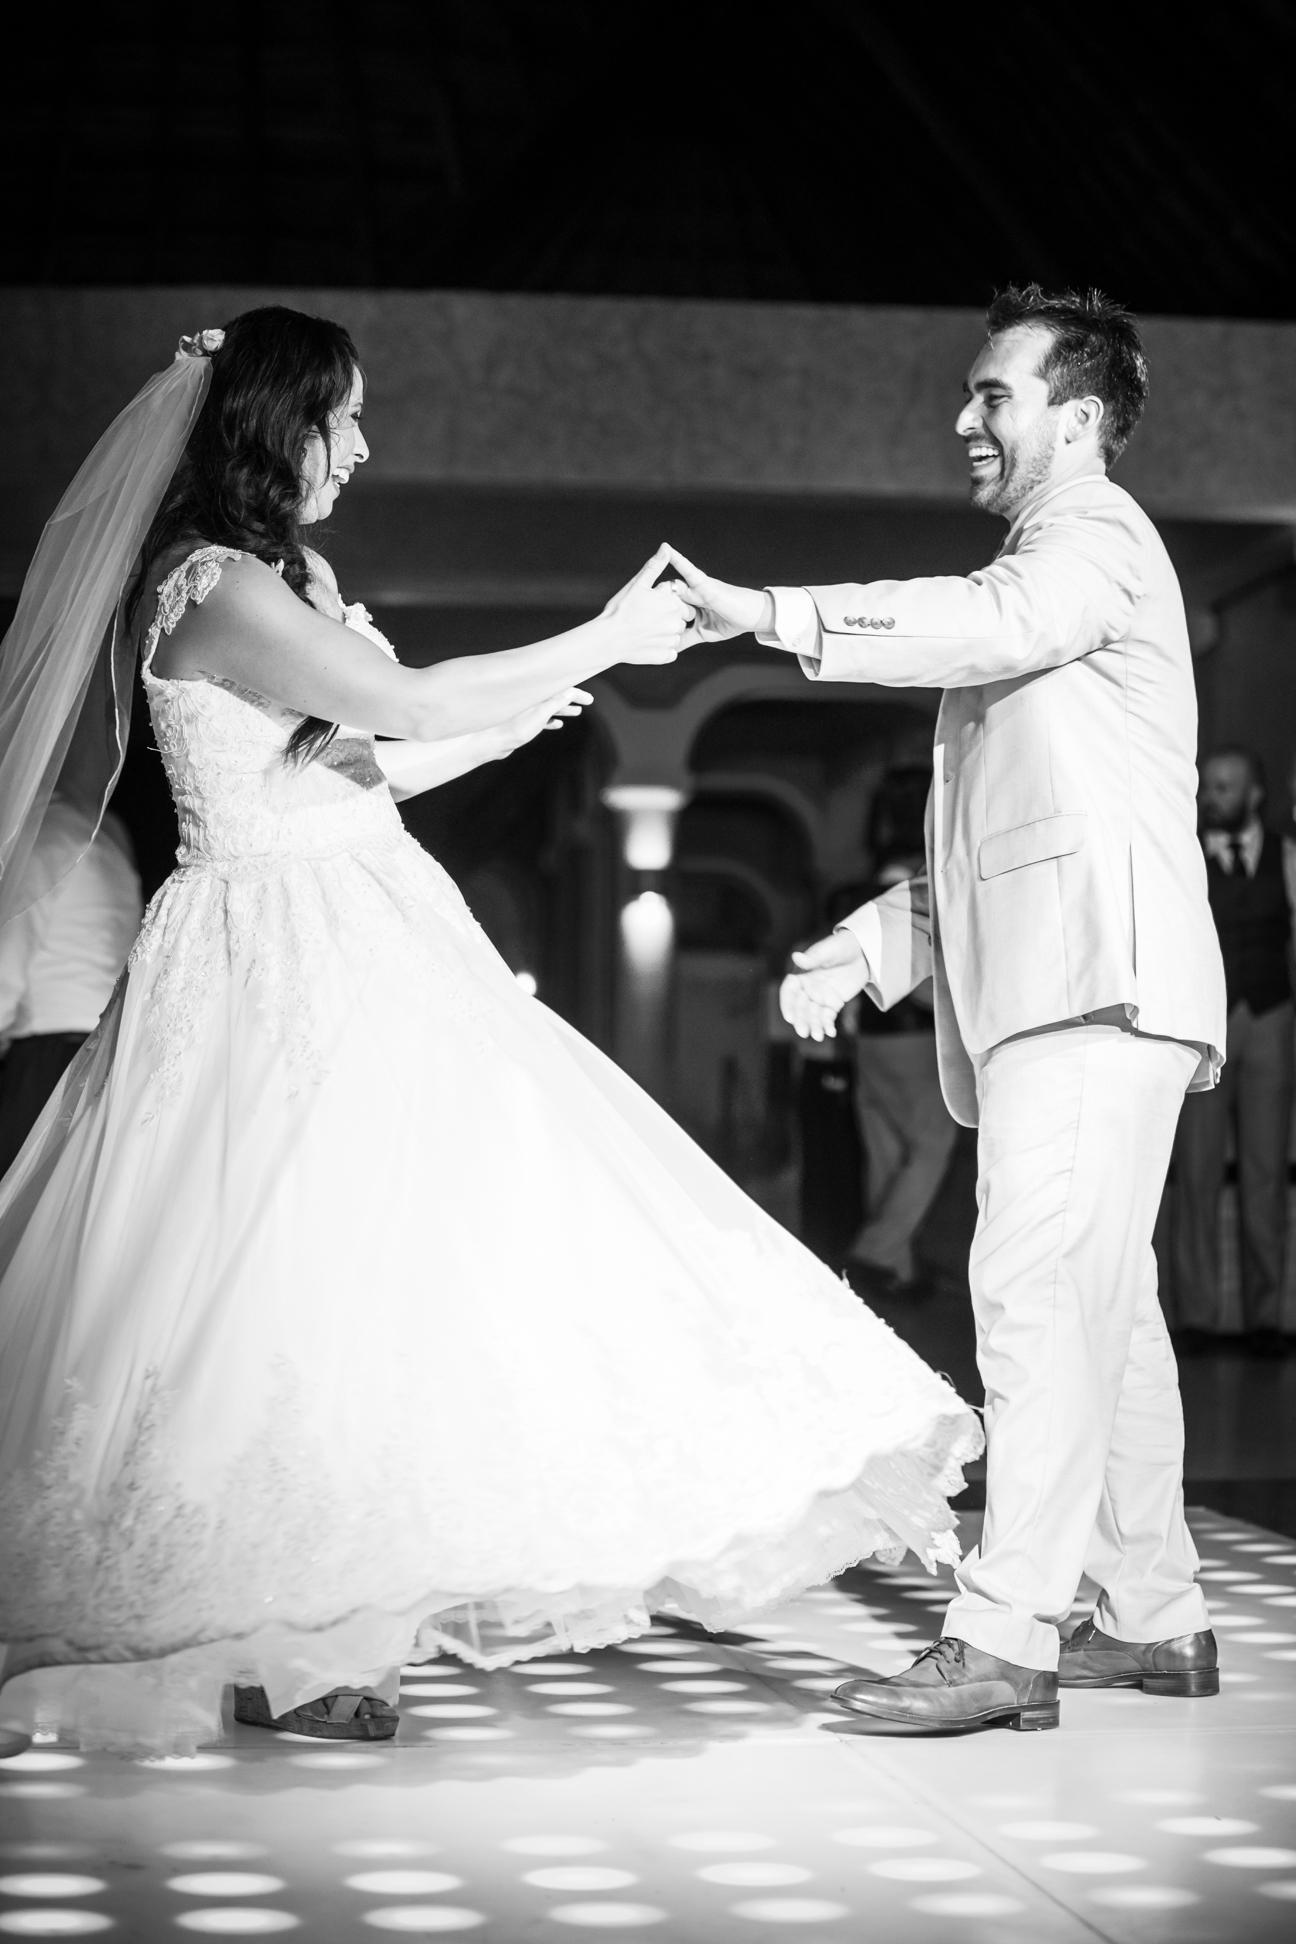 Xochitl-Alain-Wedding-248